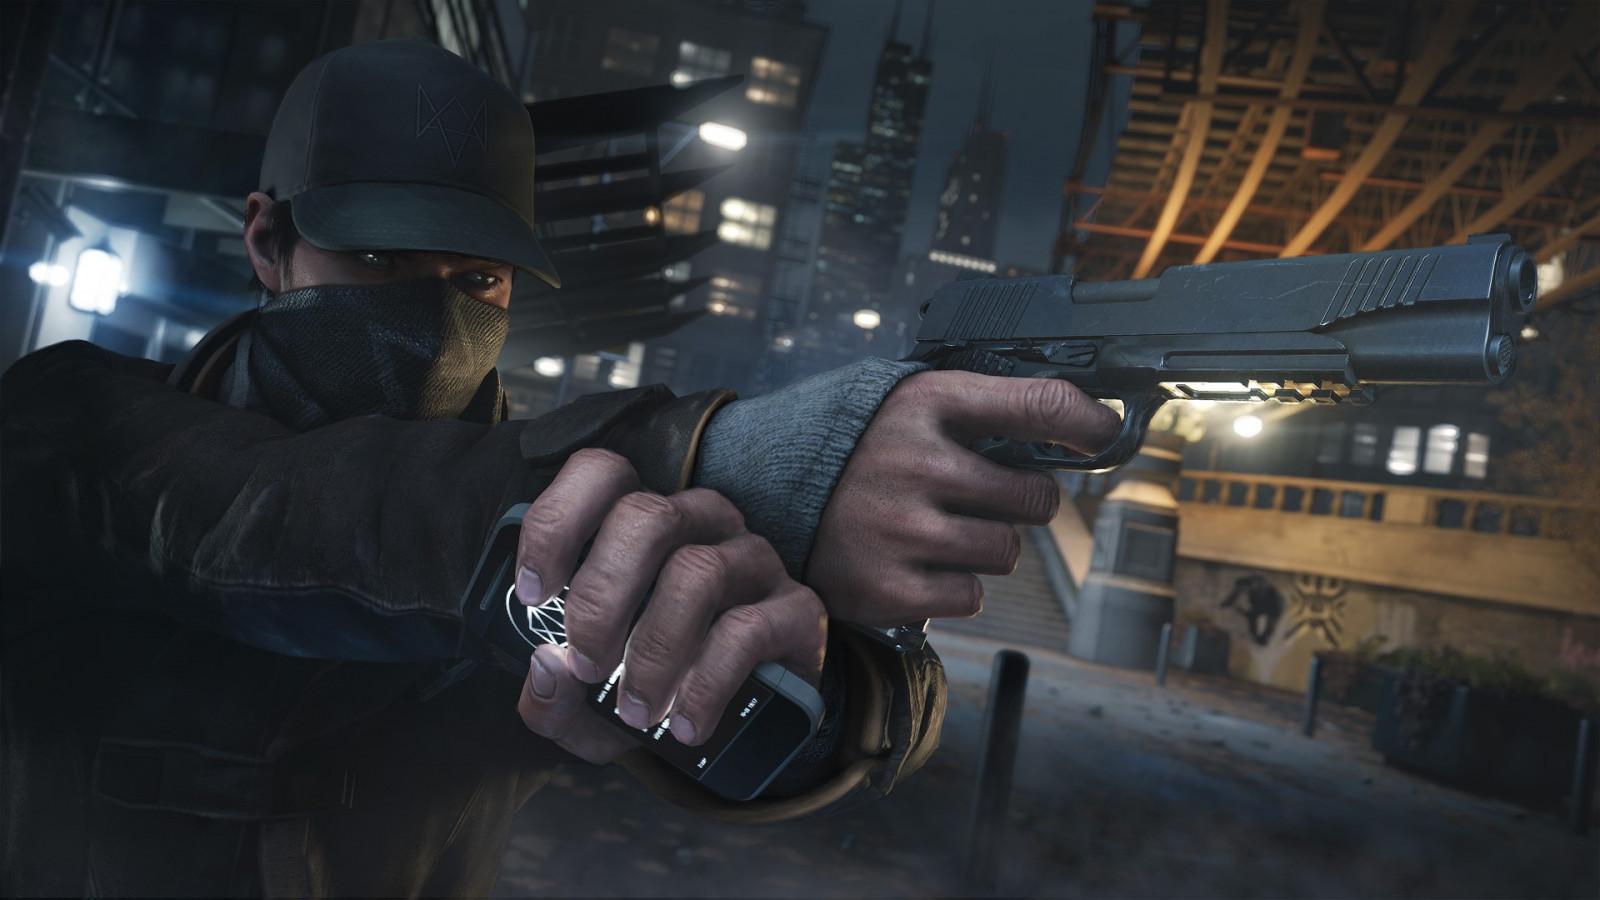 people soldier Watch Dogs darkness screenshot 1920x1080 px pc game action film mercenary firearm